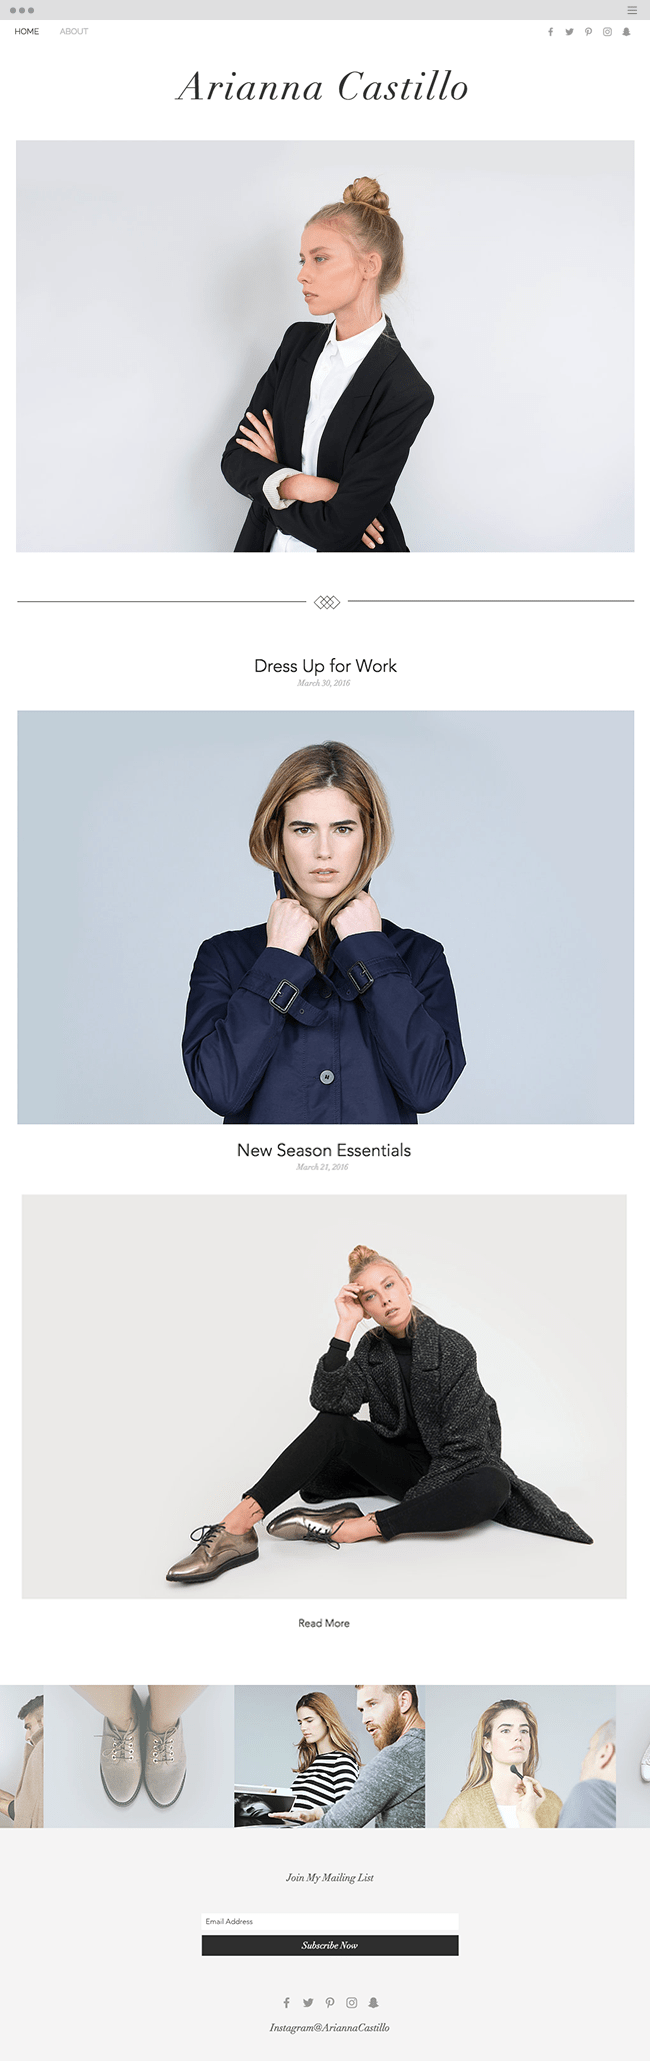 Fashionista Blog Website Template WIX